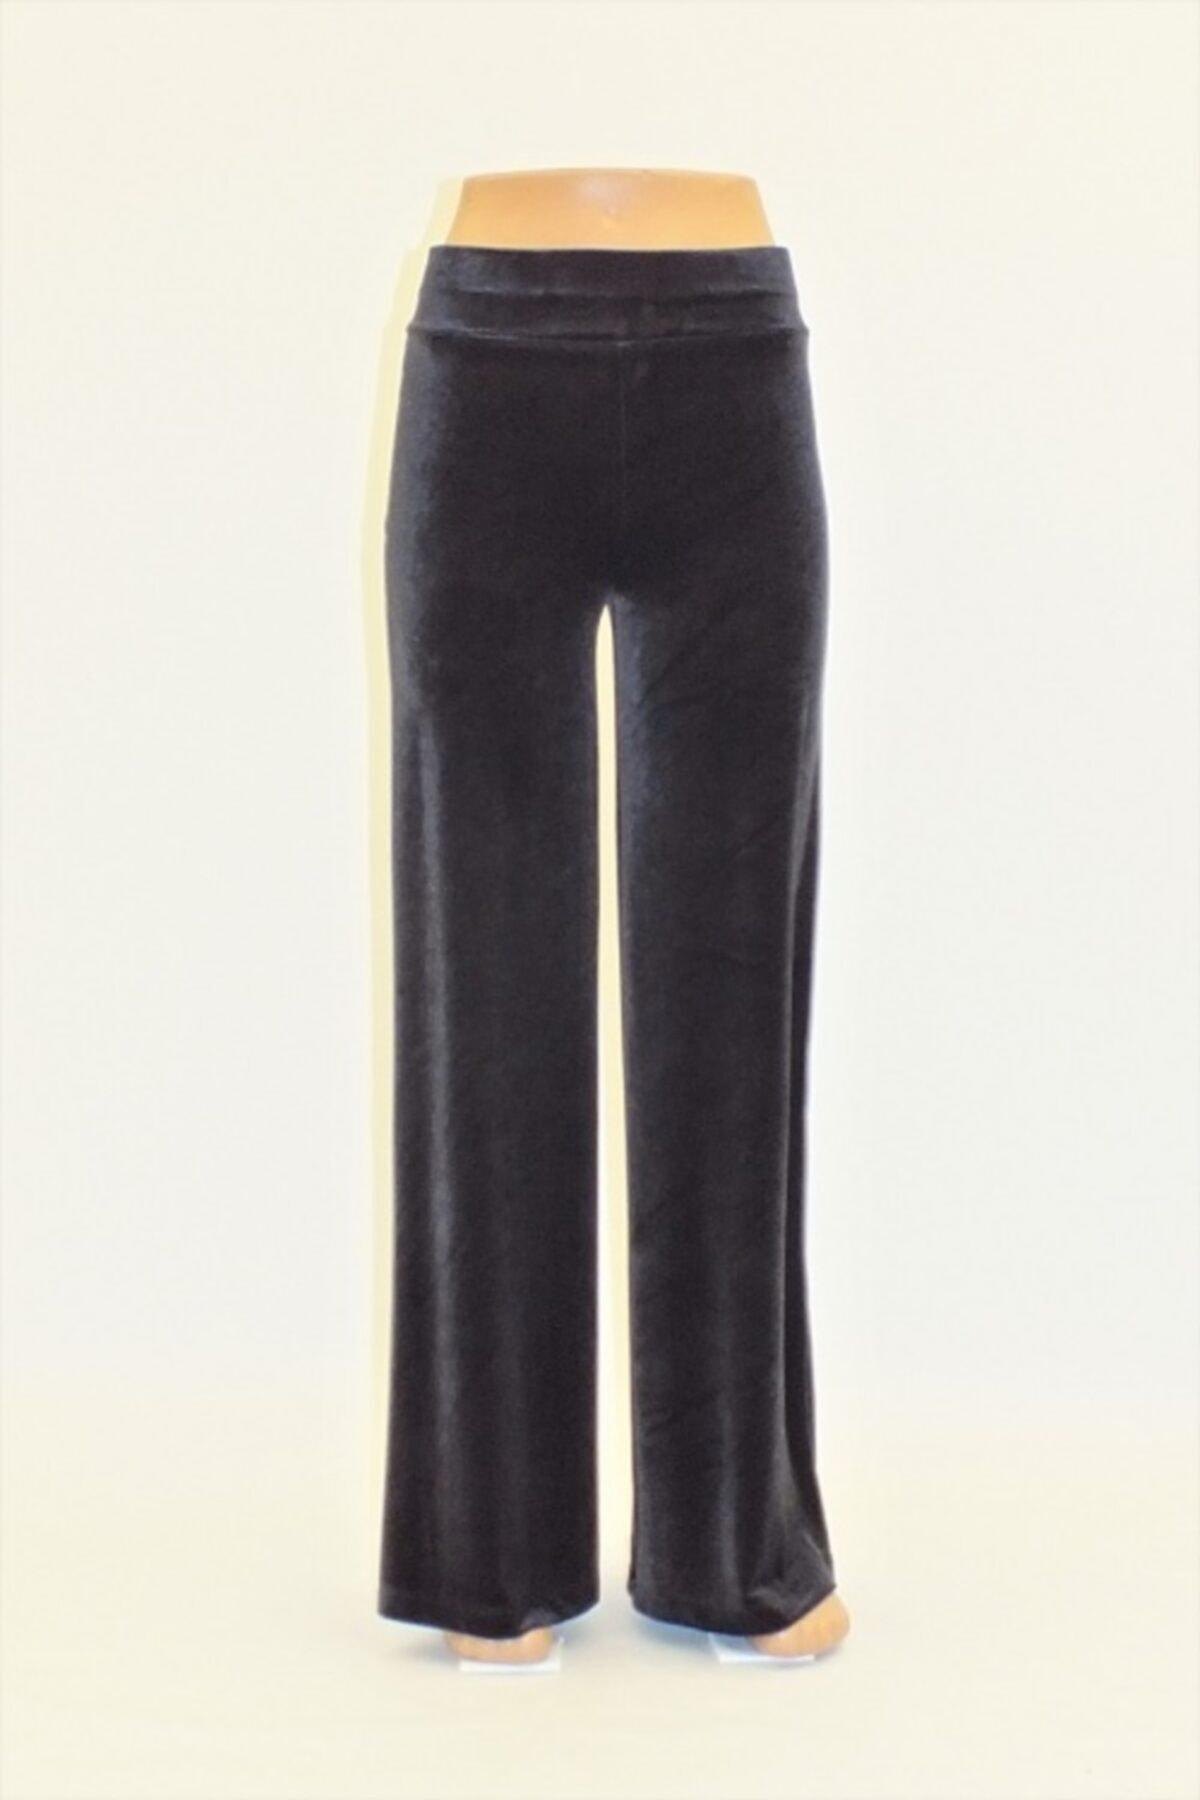 Otto Kadın Füme  Düz Kadife Geniş Paça Pantolon 1